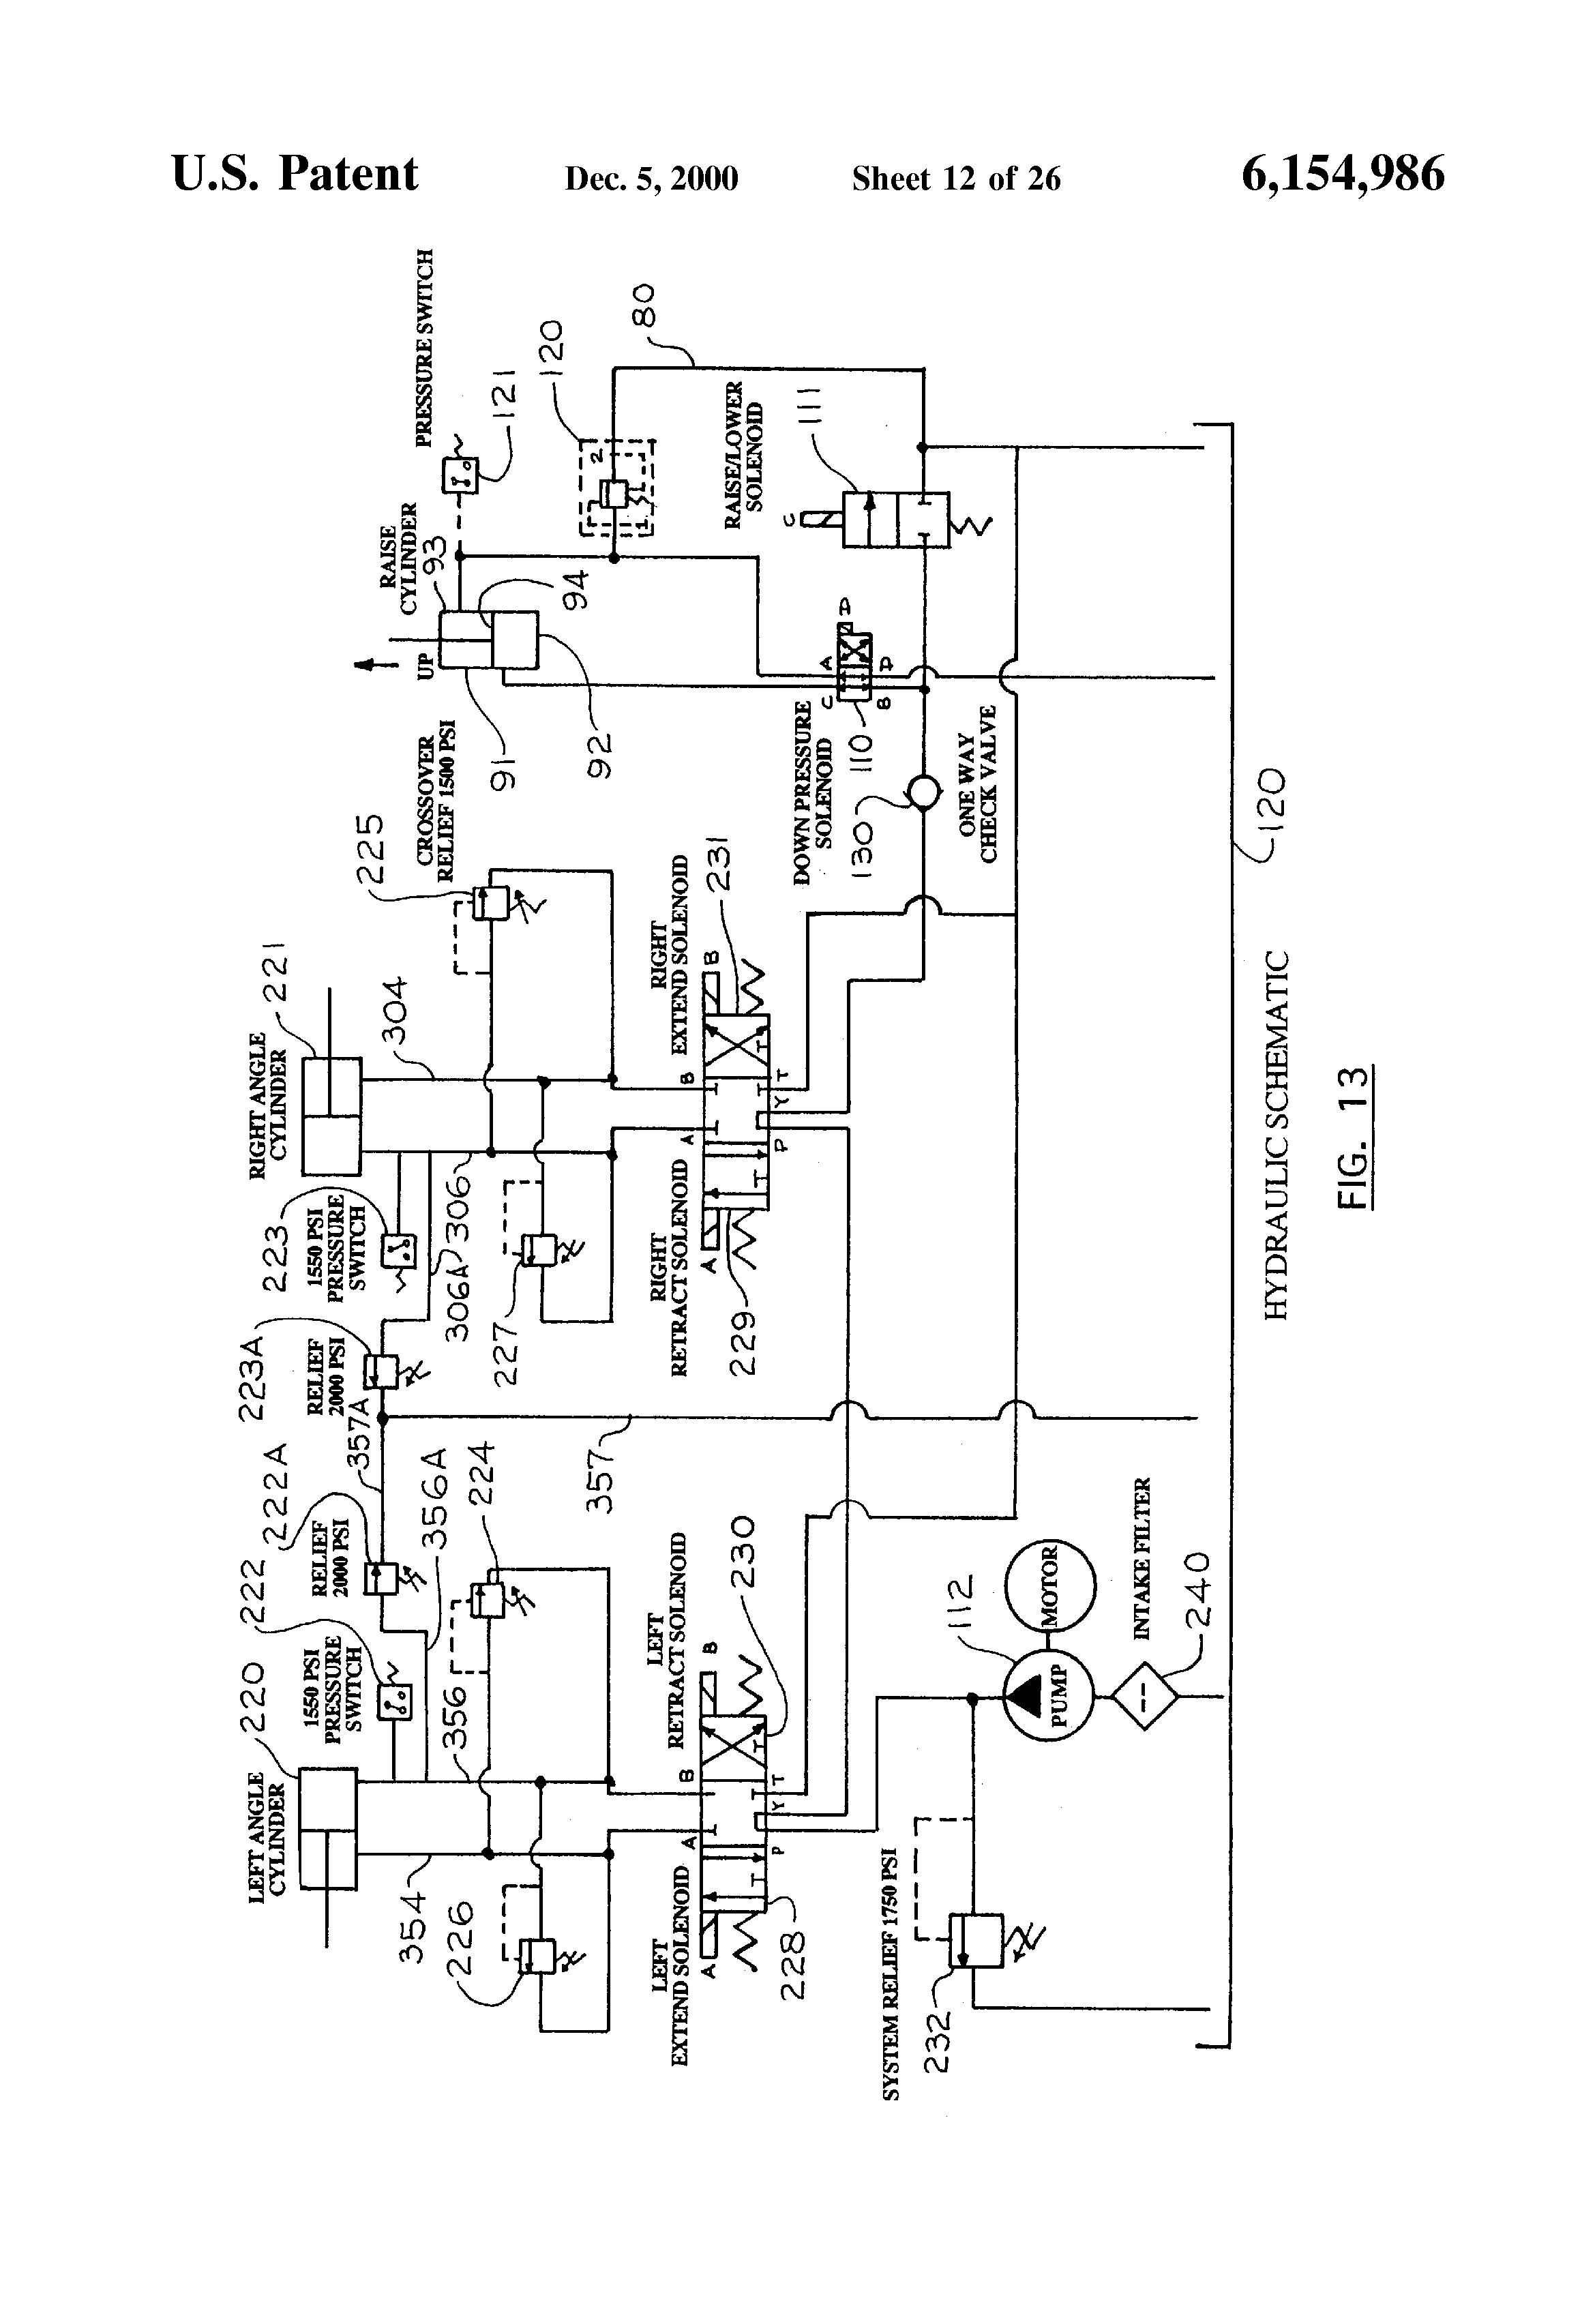 Western Unimount Pro Plow Wiring Diagram : Meyer plow wiring diagram car sno way diagrams